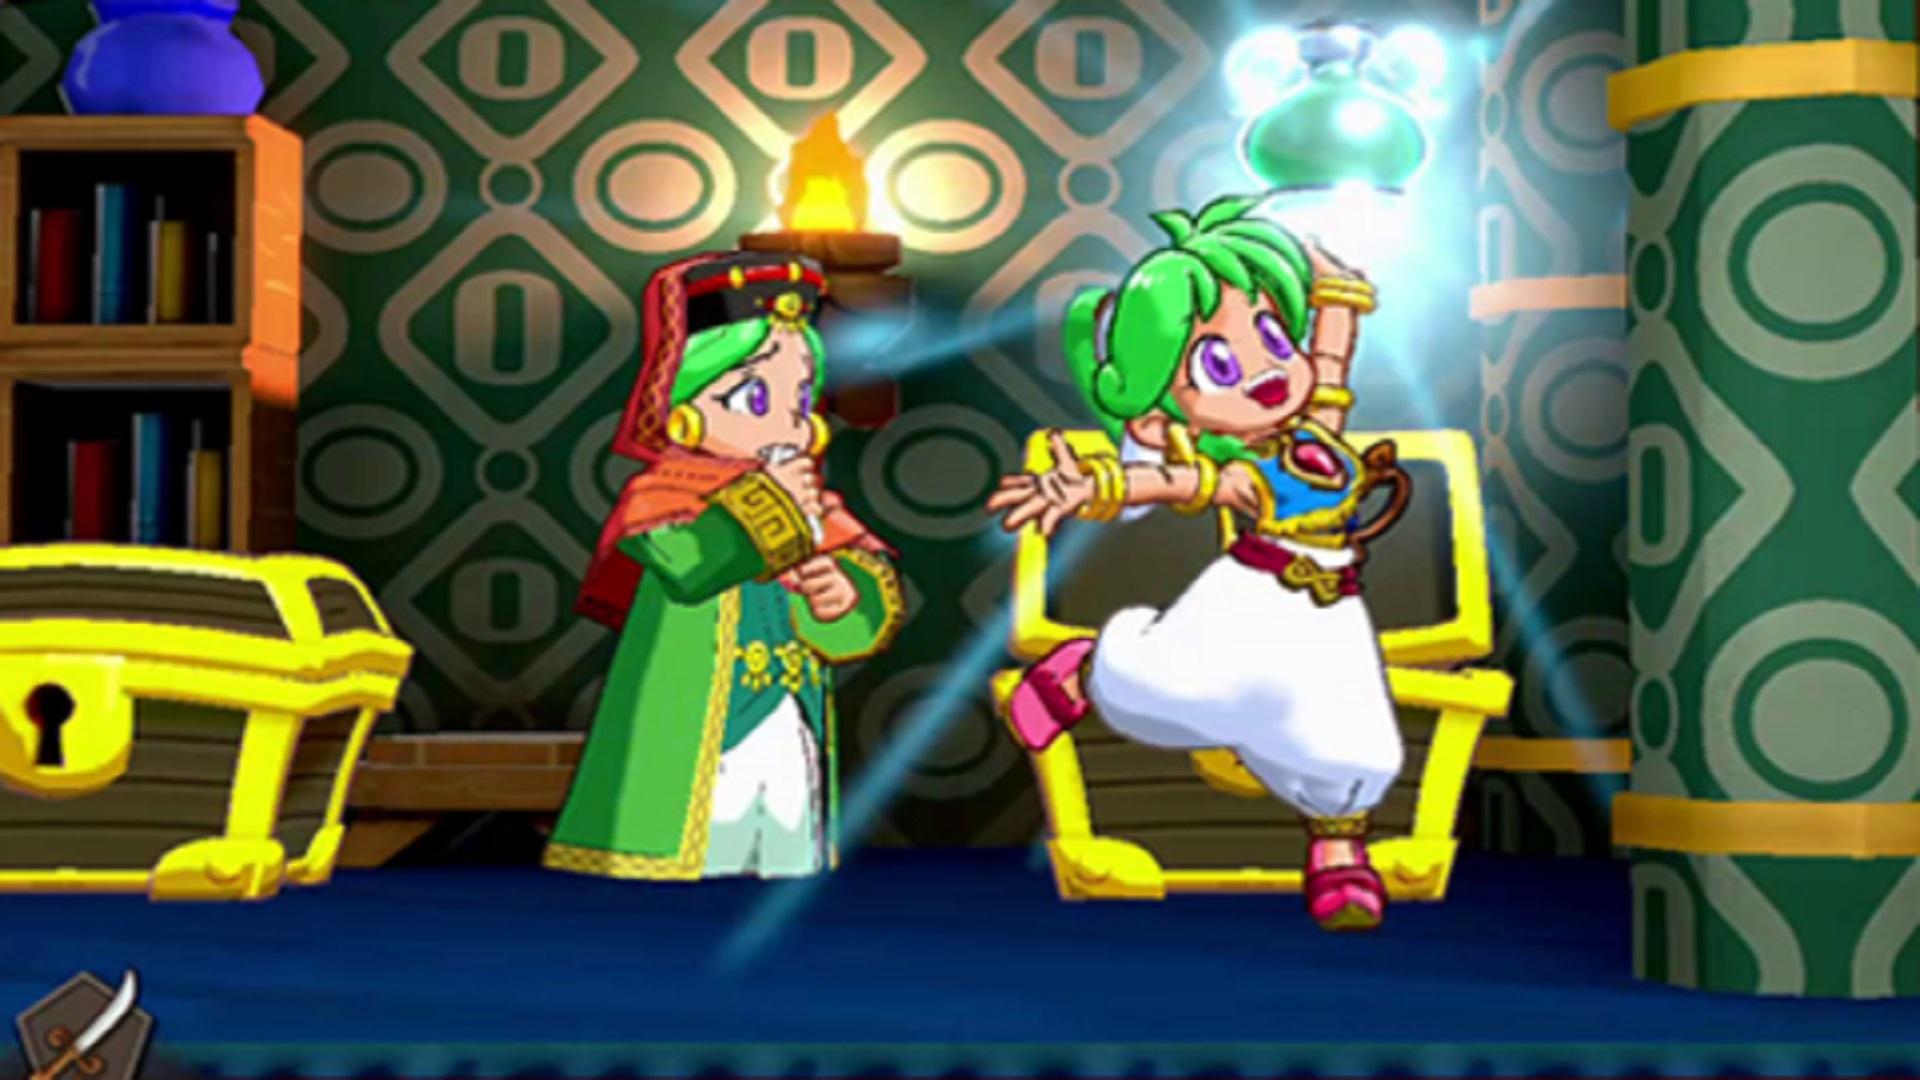 Wonder Boy: Asha in Monster World receives a brand new trailer   Pocket Tactics